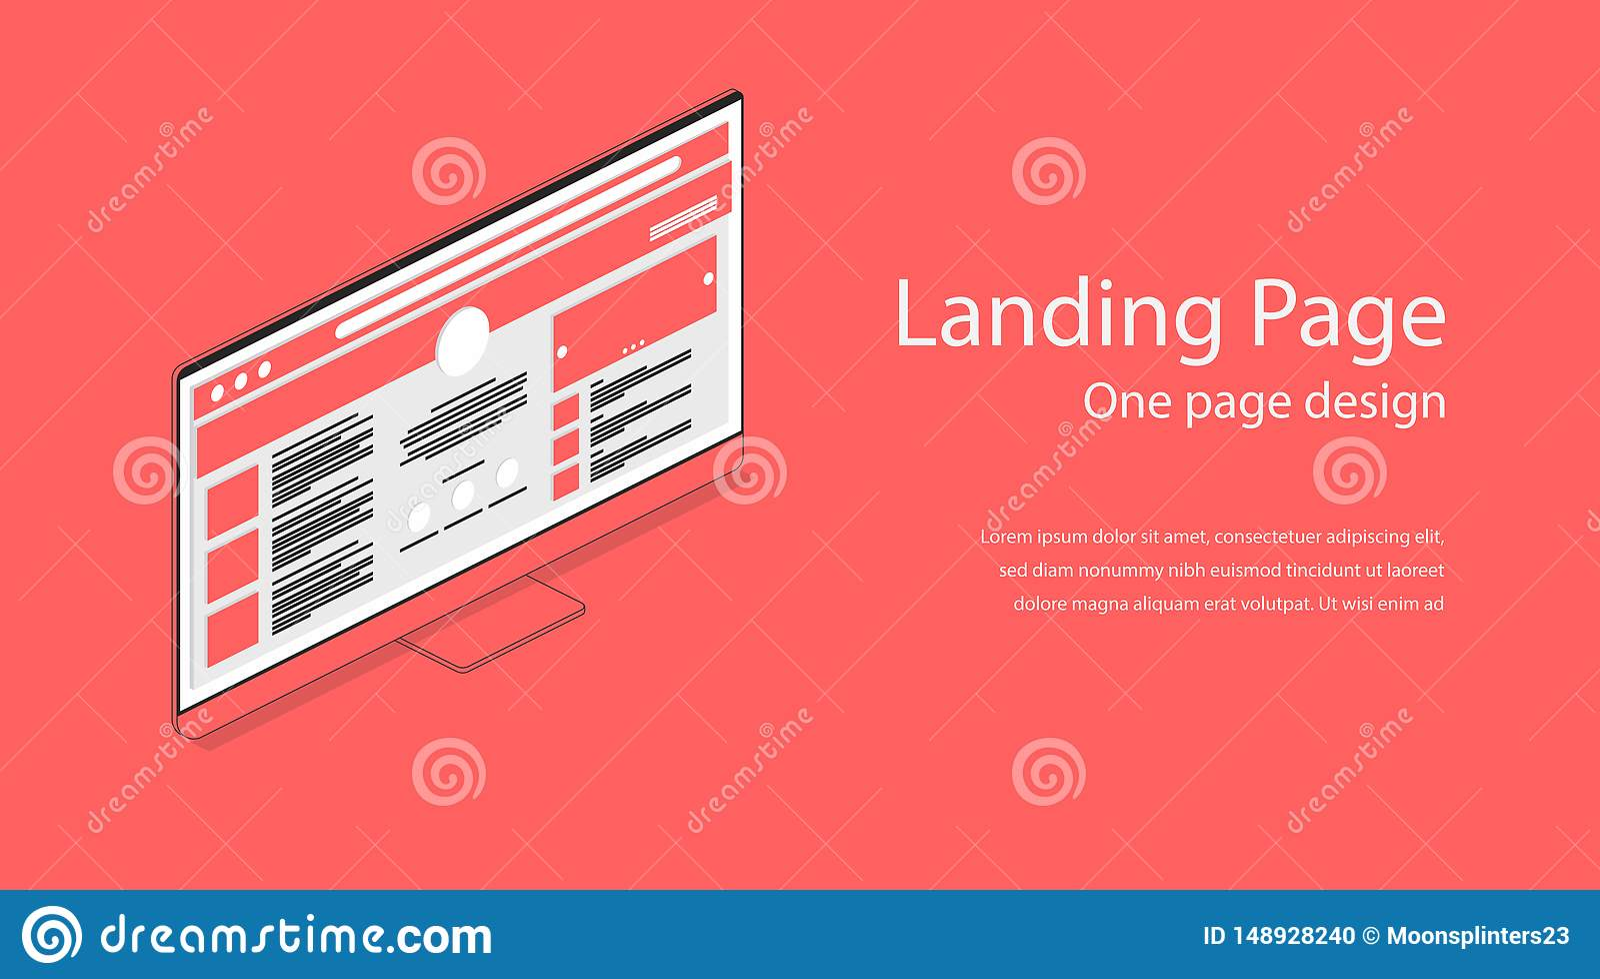 Web One Landing Page Design Template Flat Isometric Modern